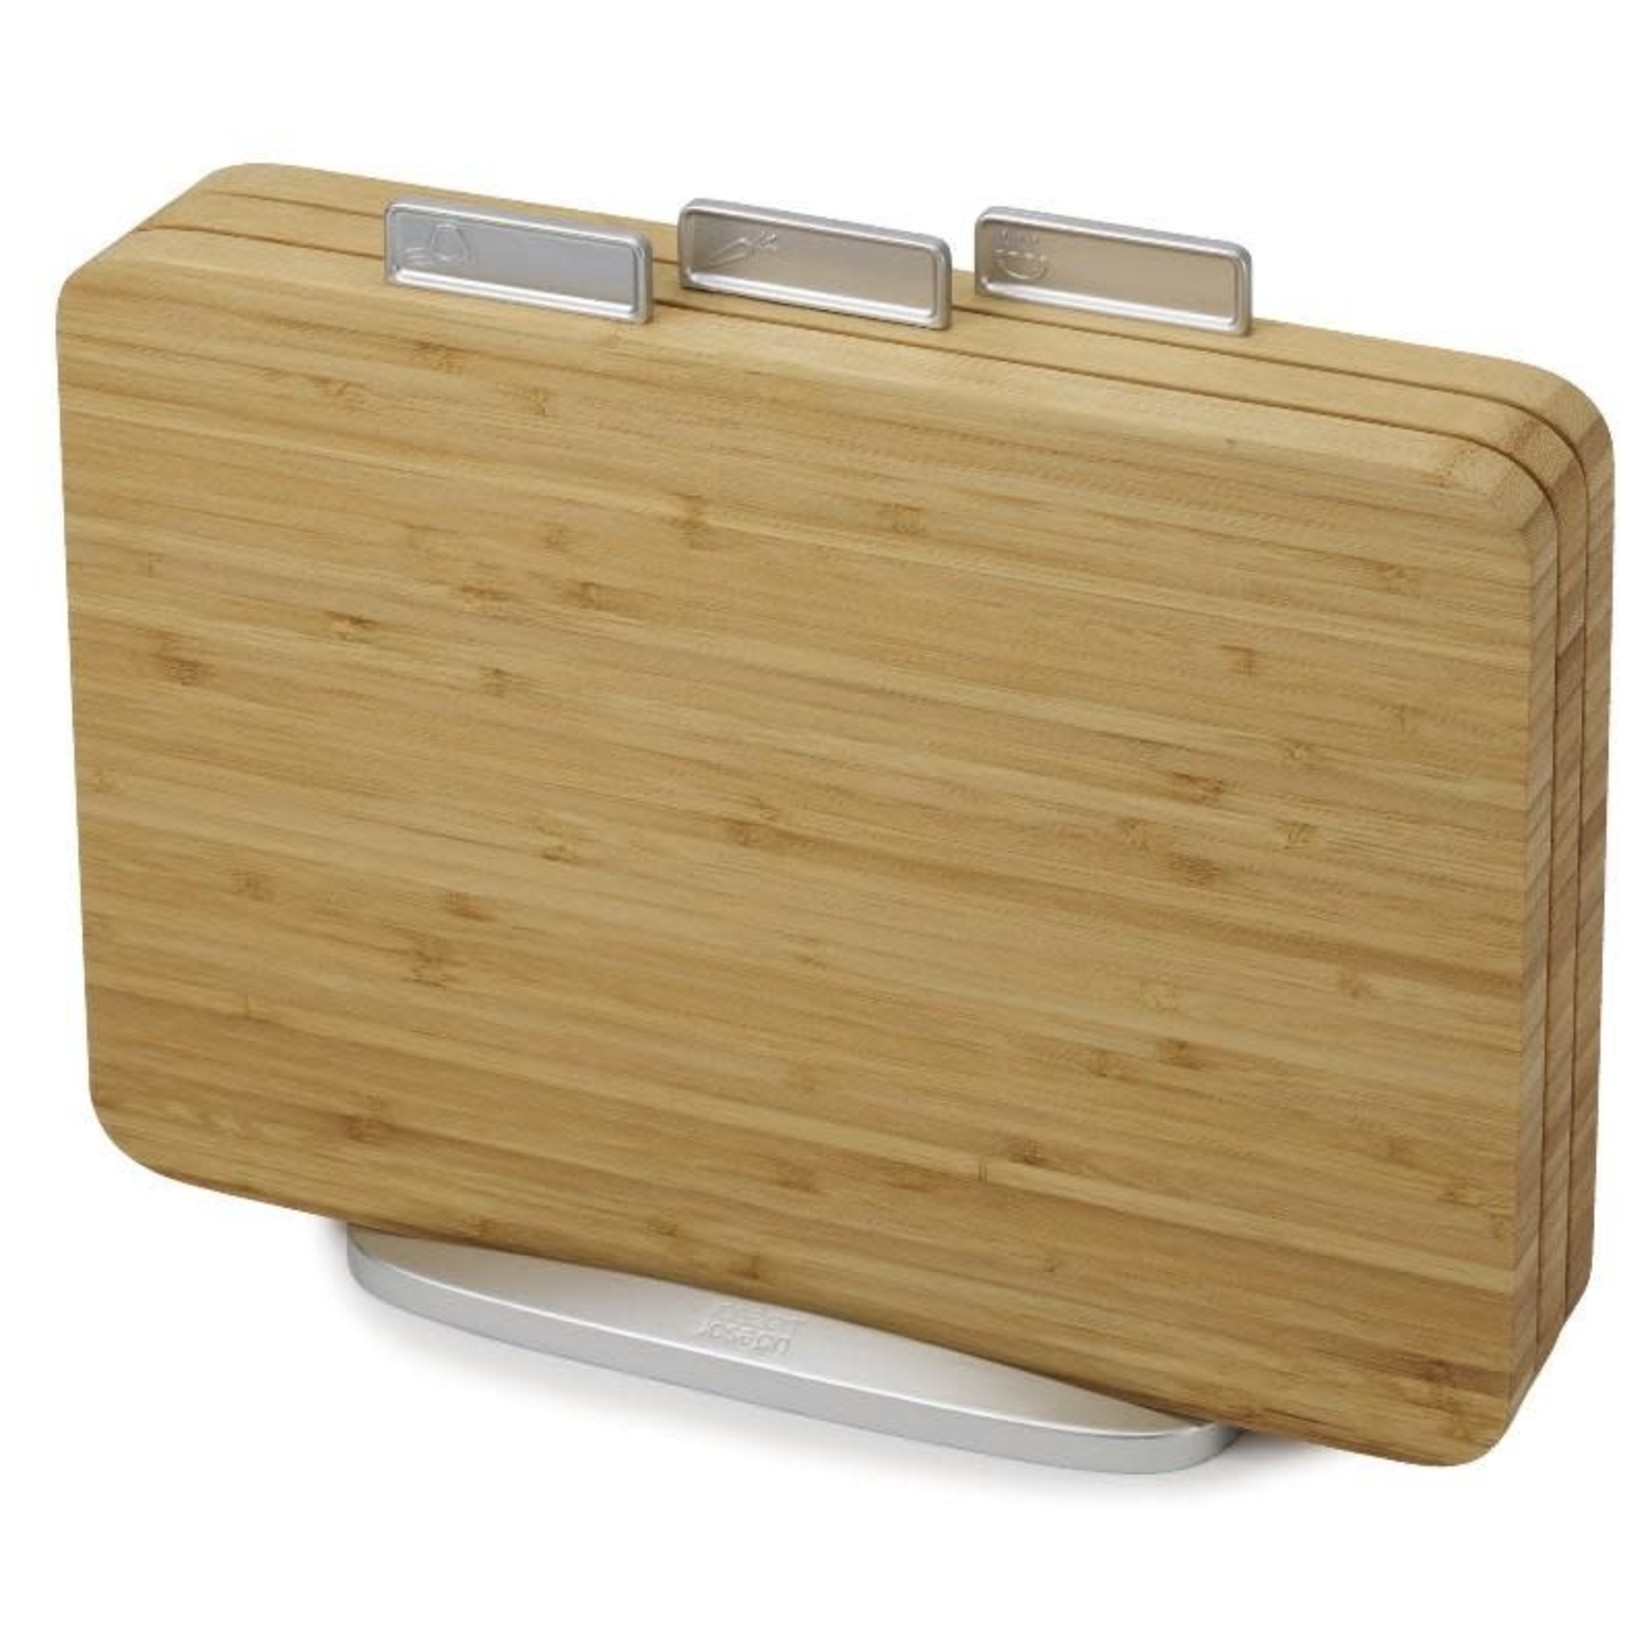 Joseph Joseph Index Bamboo Boards & Stand